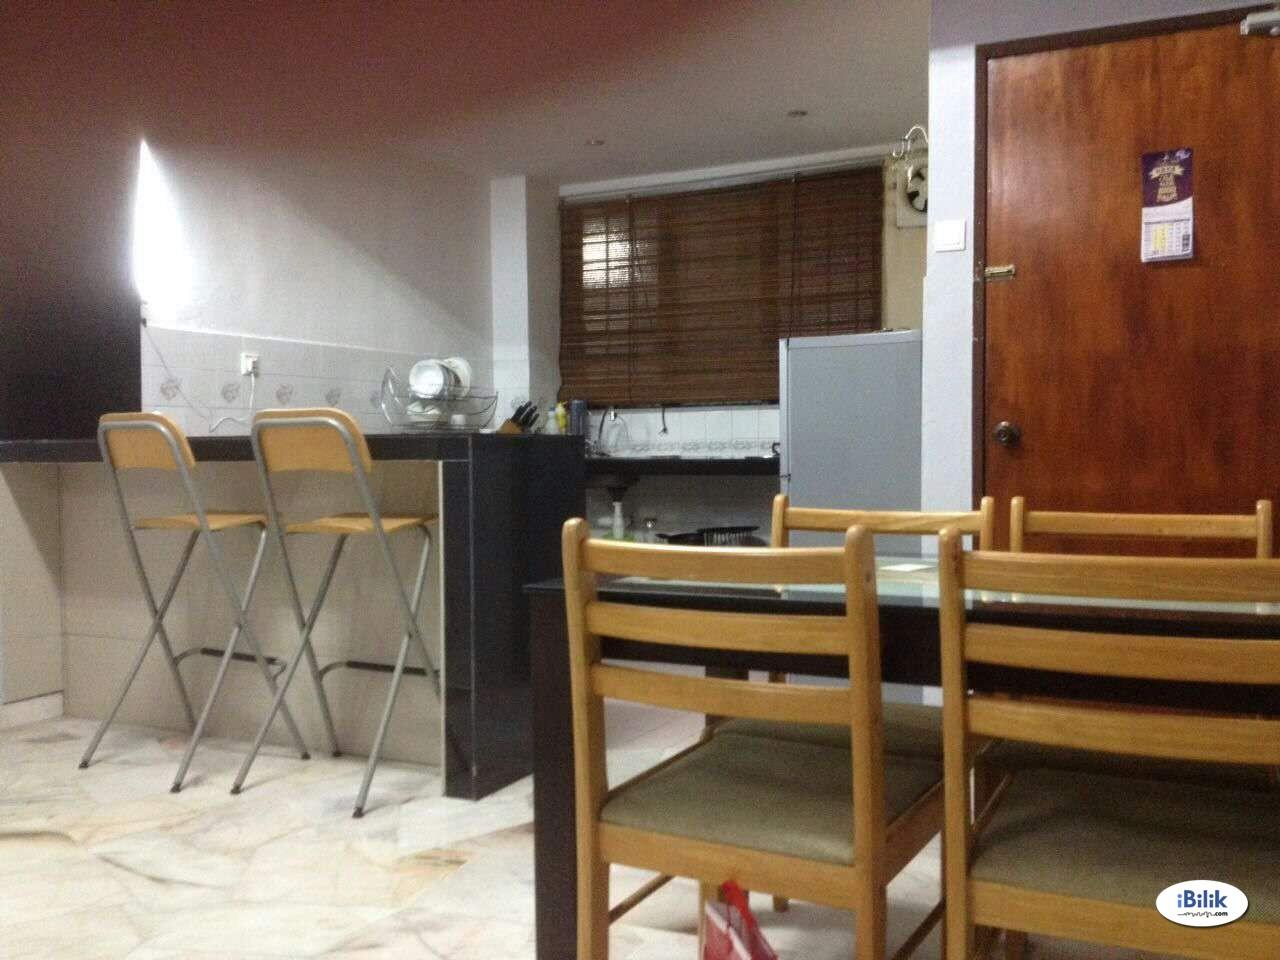 Middle Room at Taman Sungai Besi Indah, Seri Kembangan